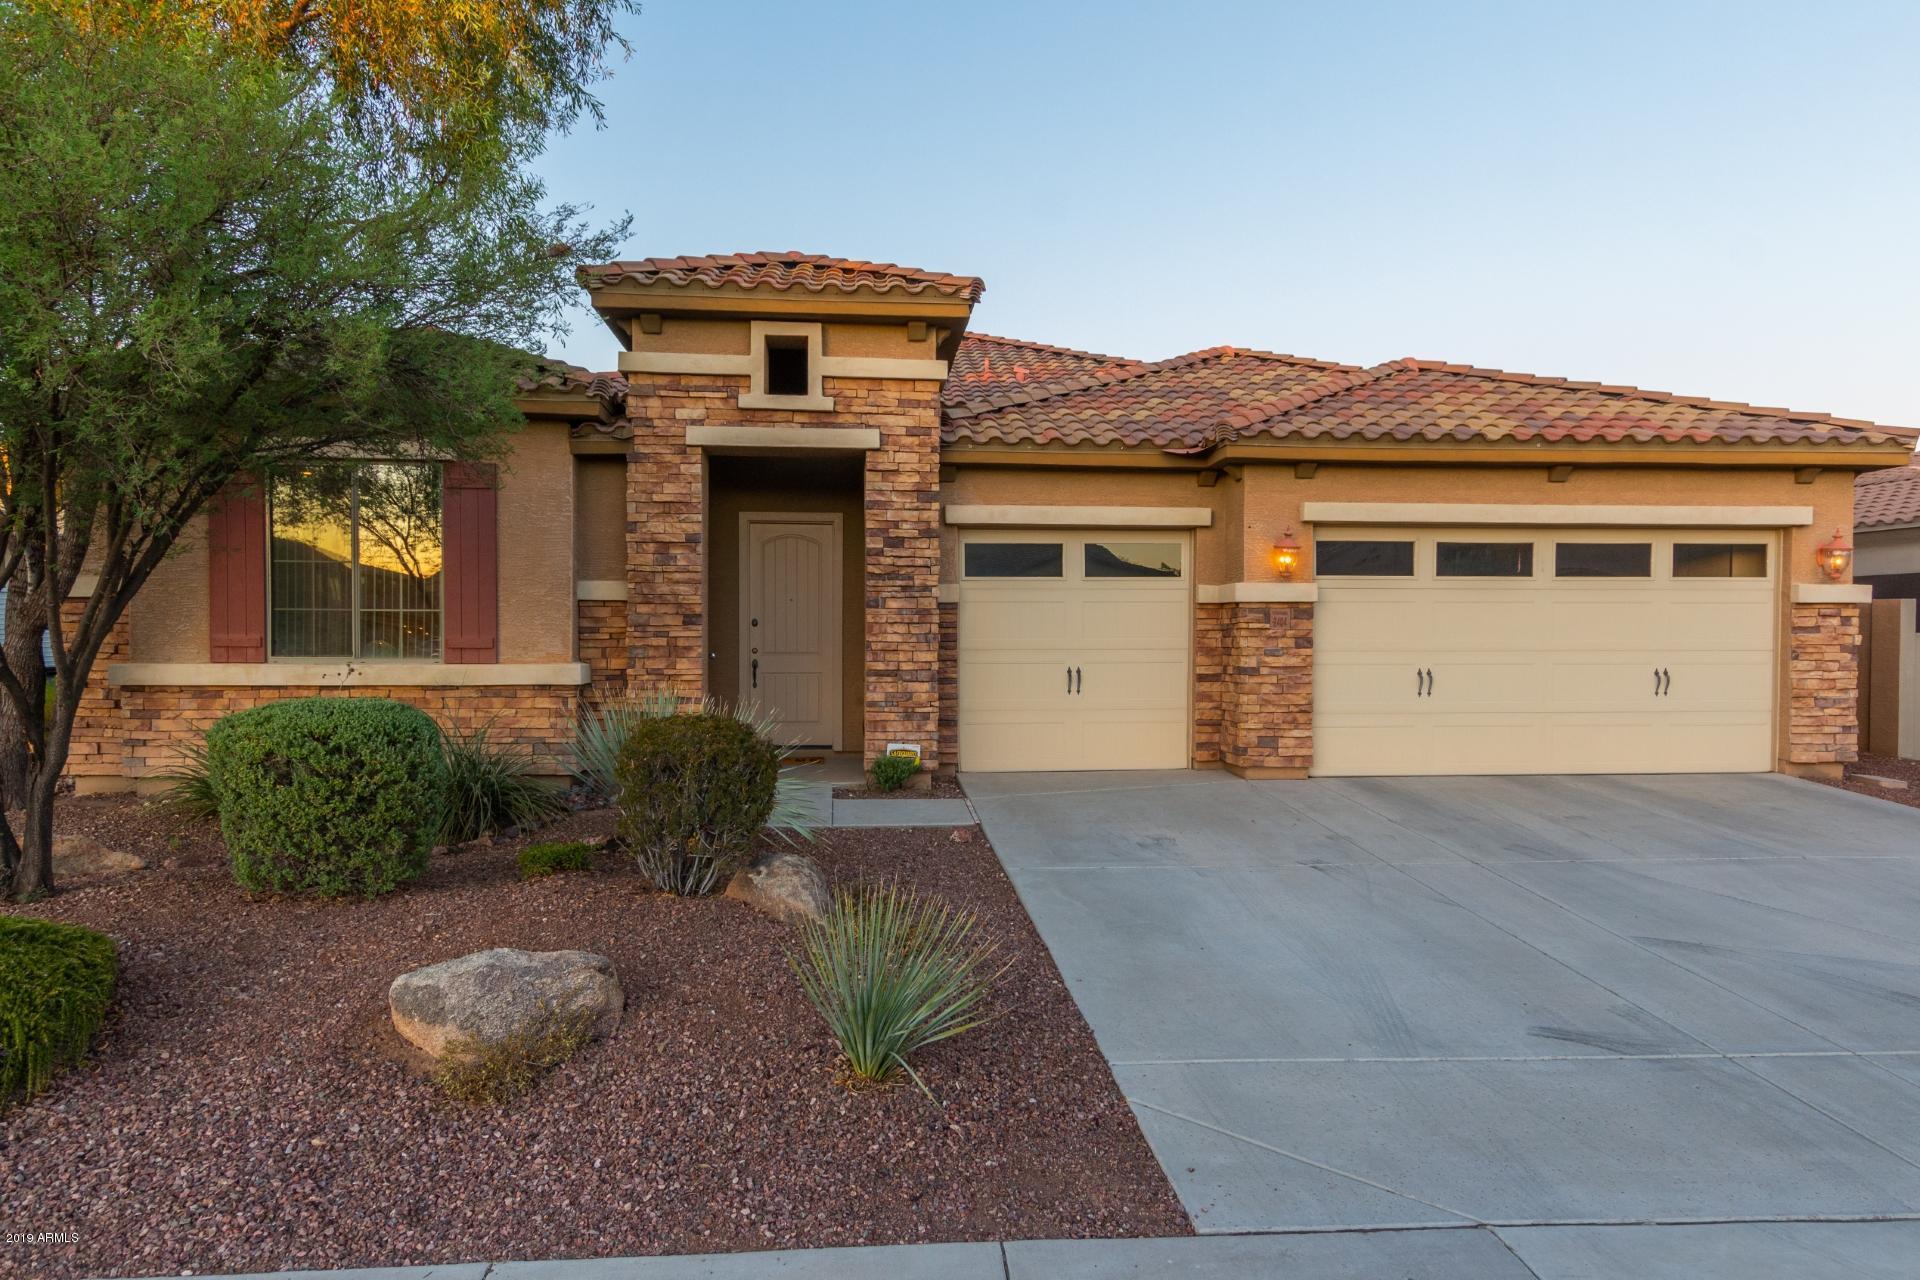 Photo of 2404 E ROBB Lane, Phoenix, AZ 85024